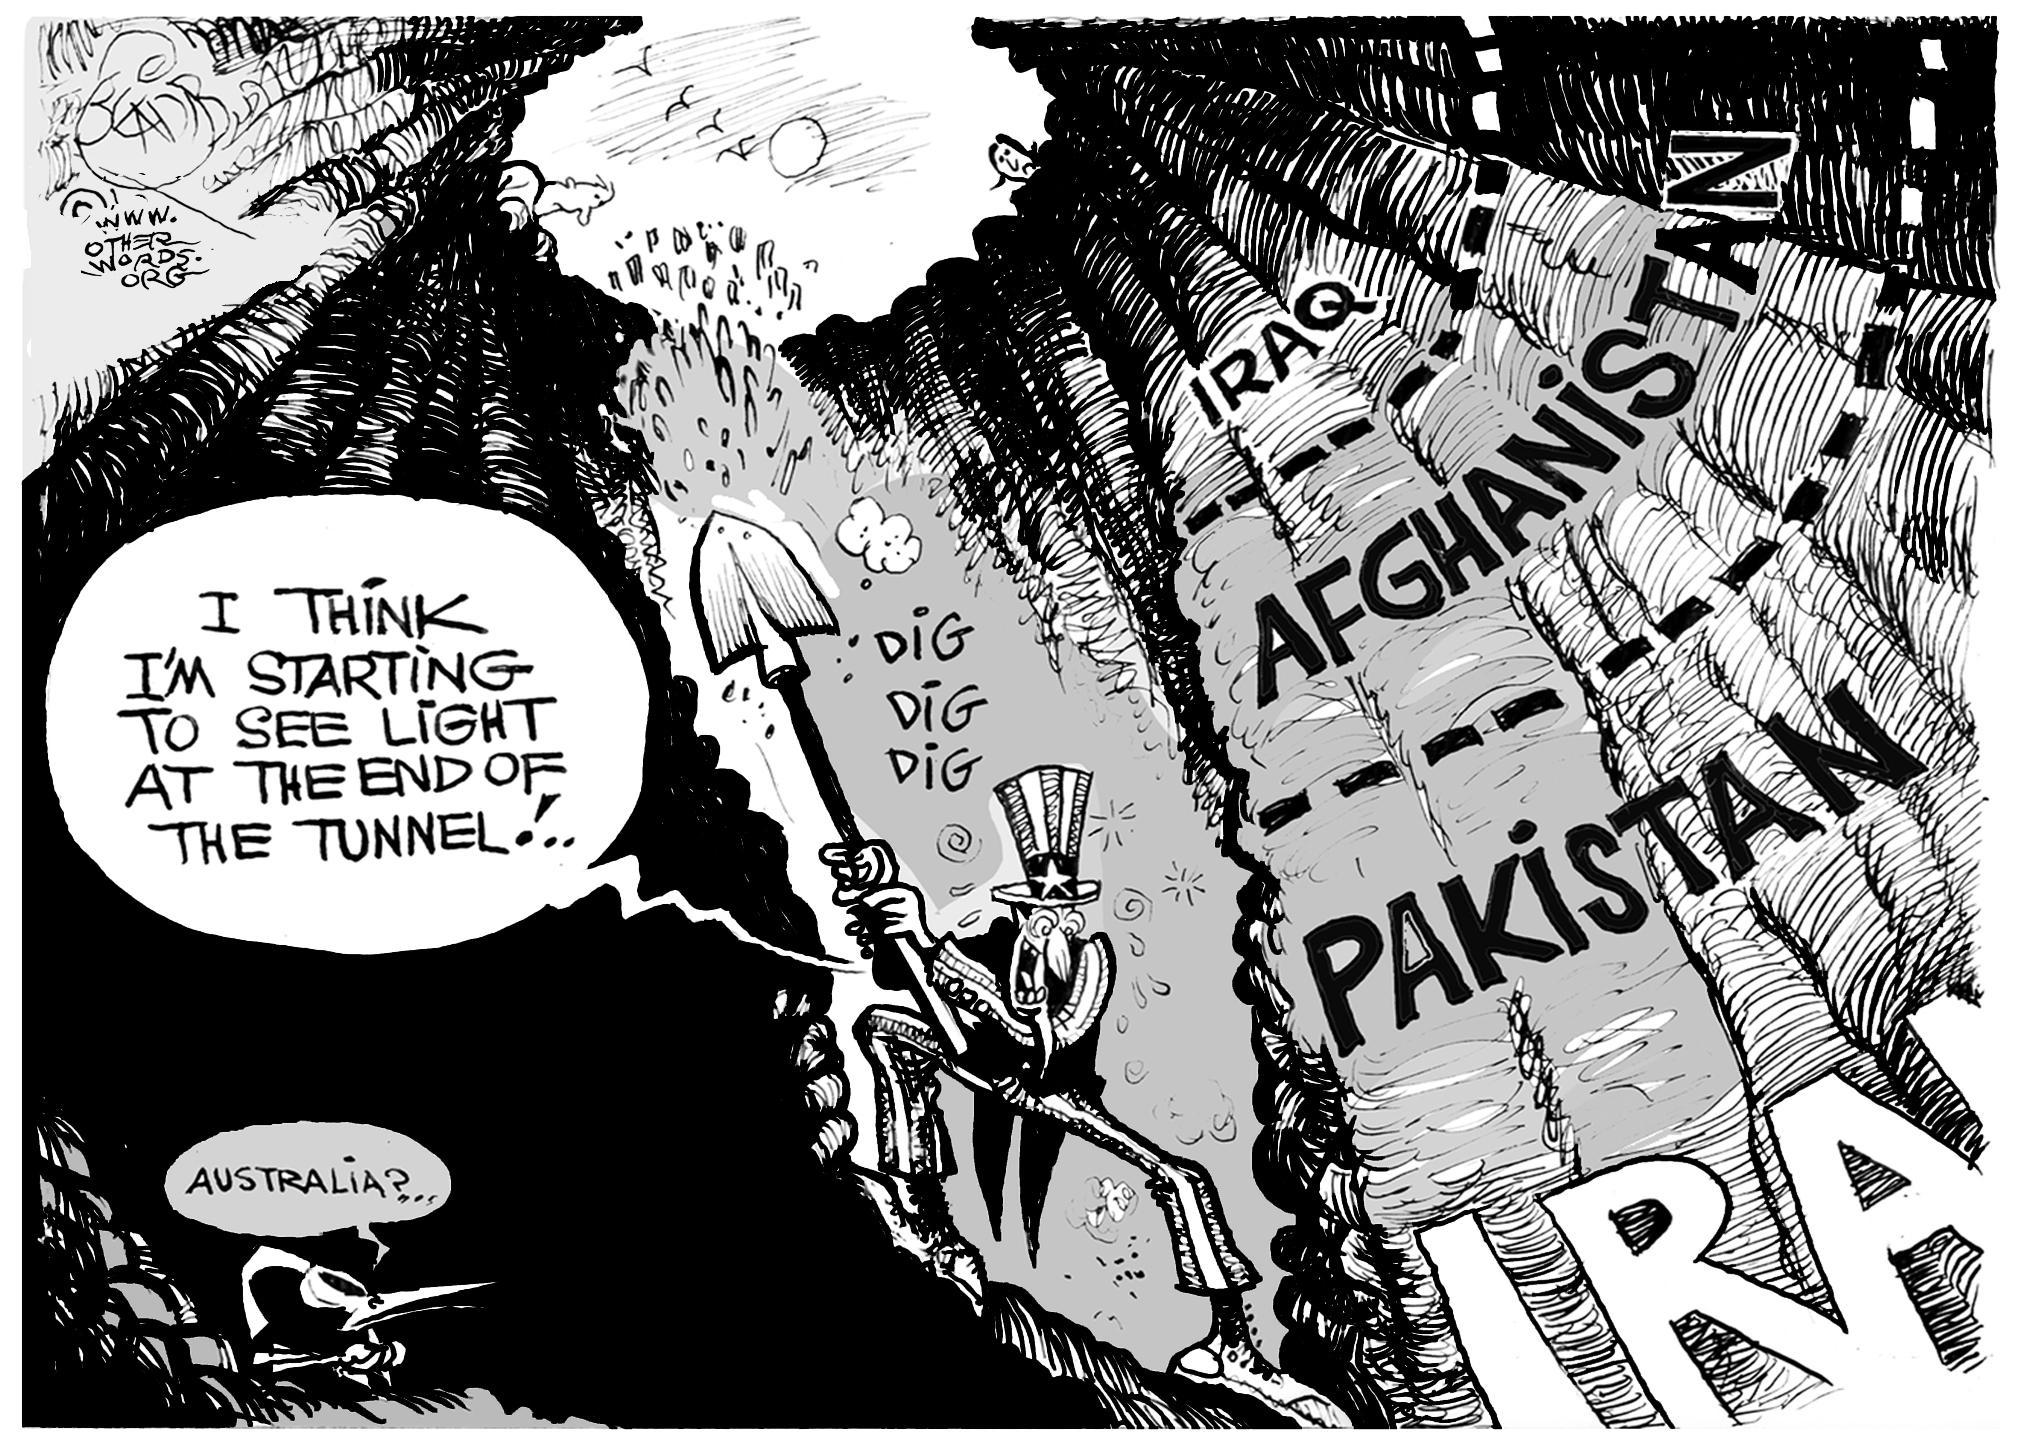 Afghanistan's Poppy War